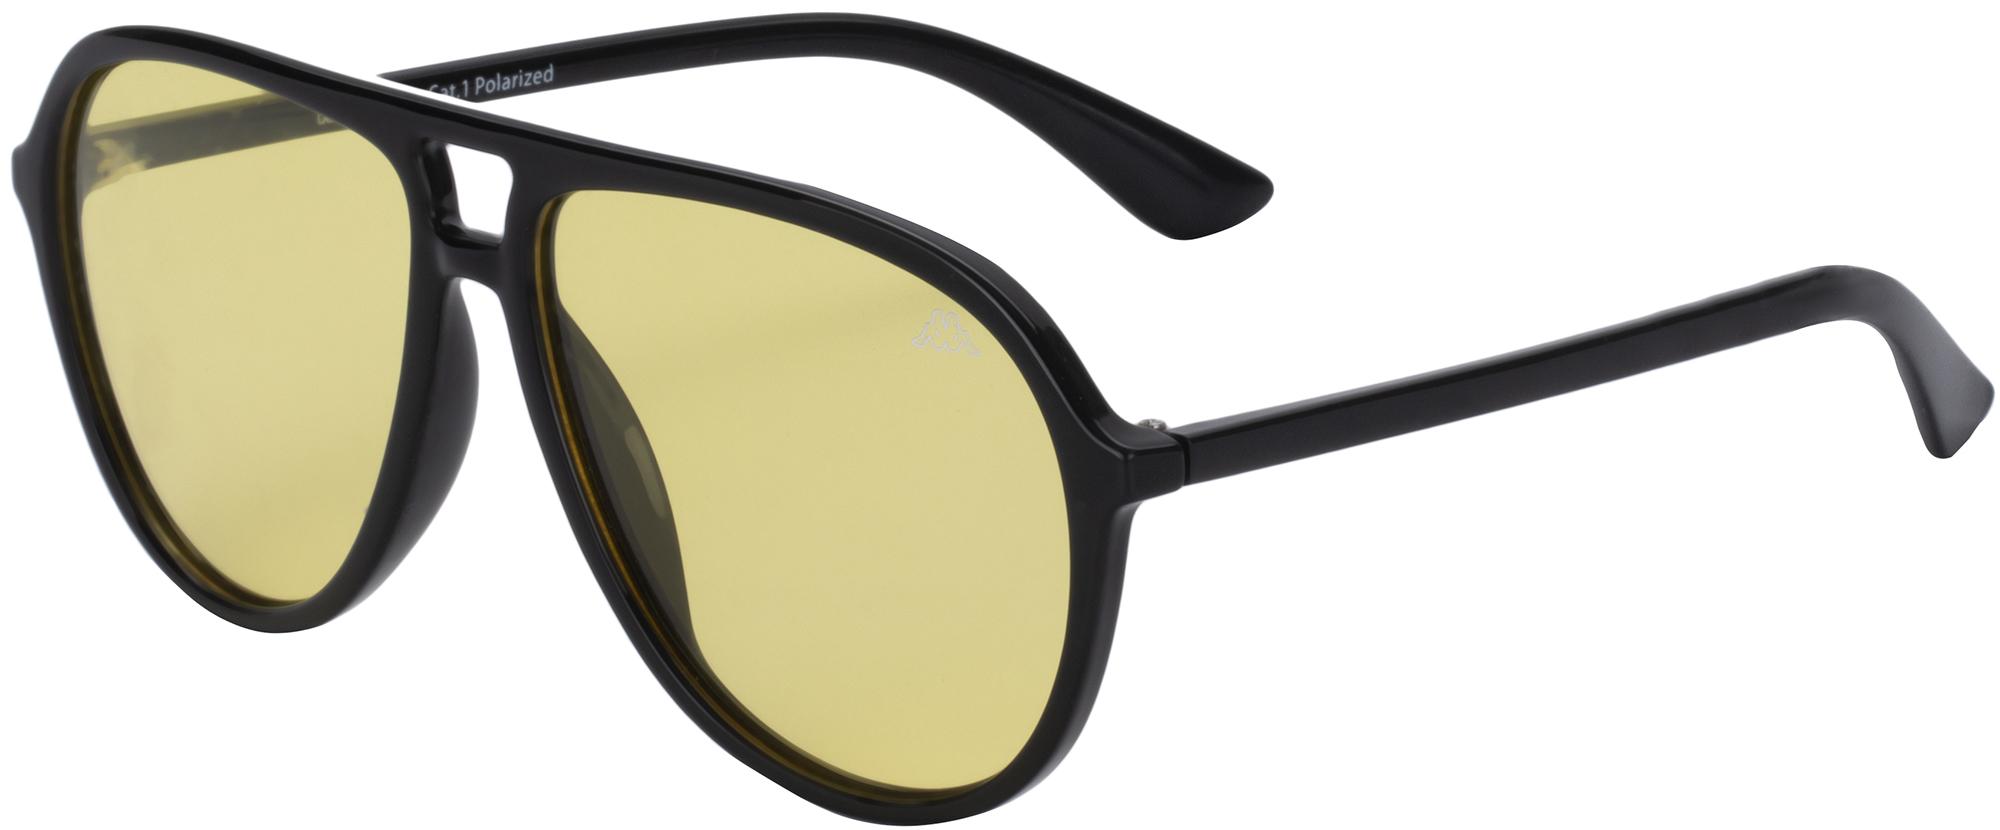 цена Kappa Солнцезащитные очки Kappa